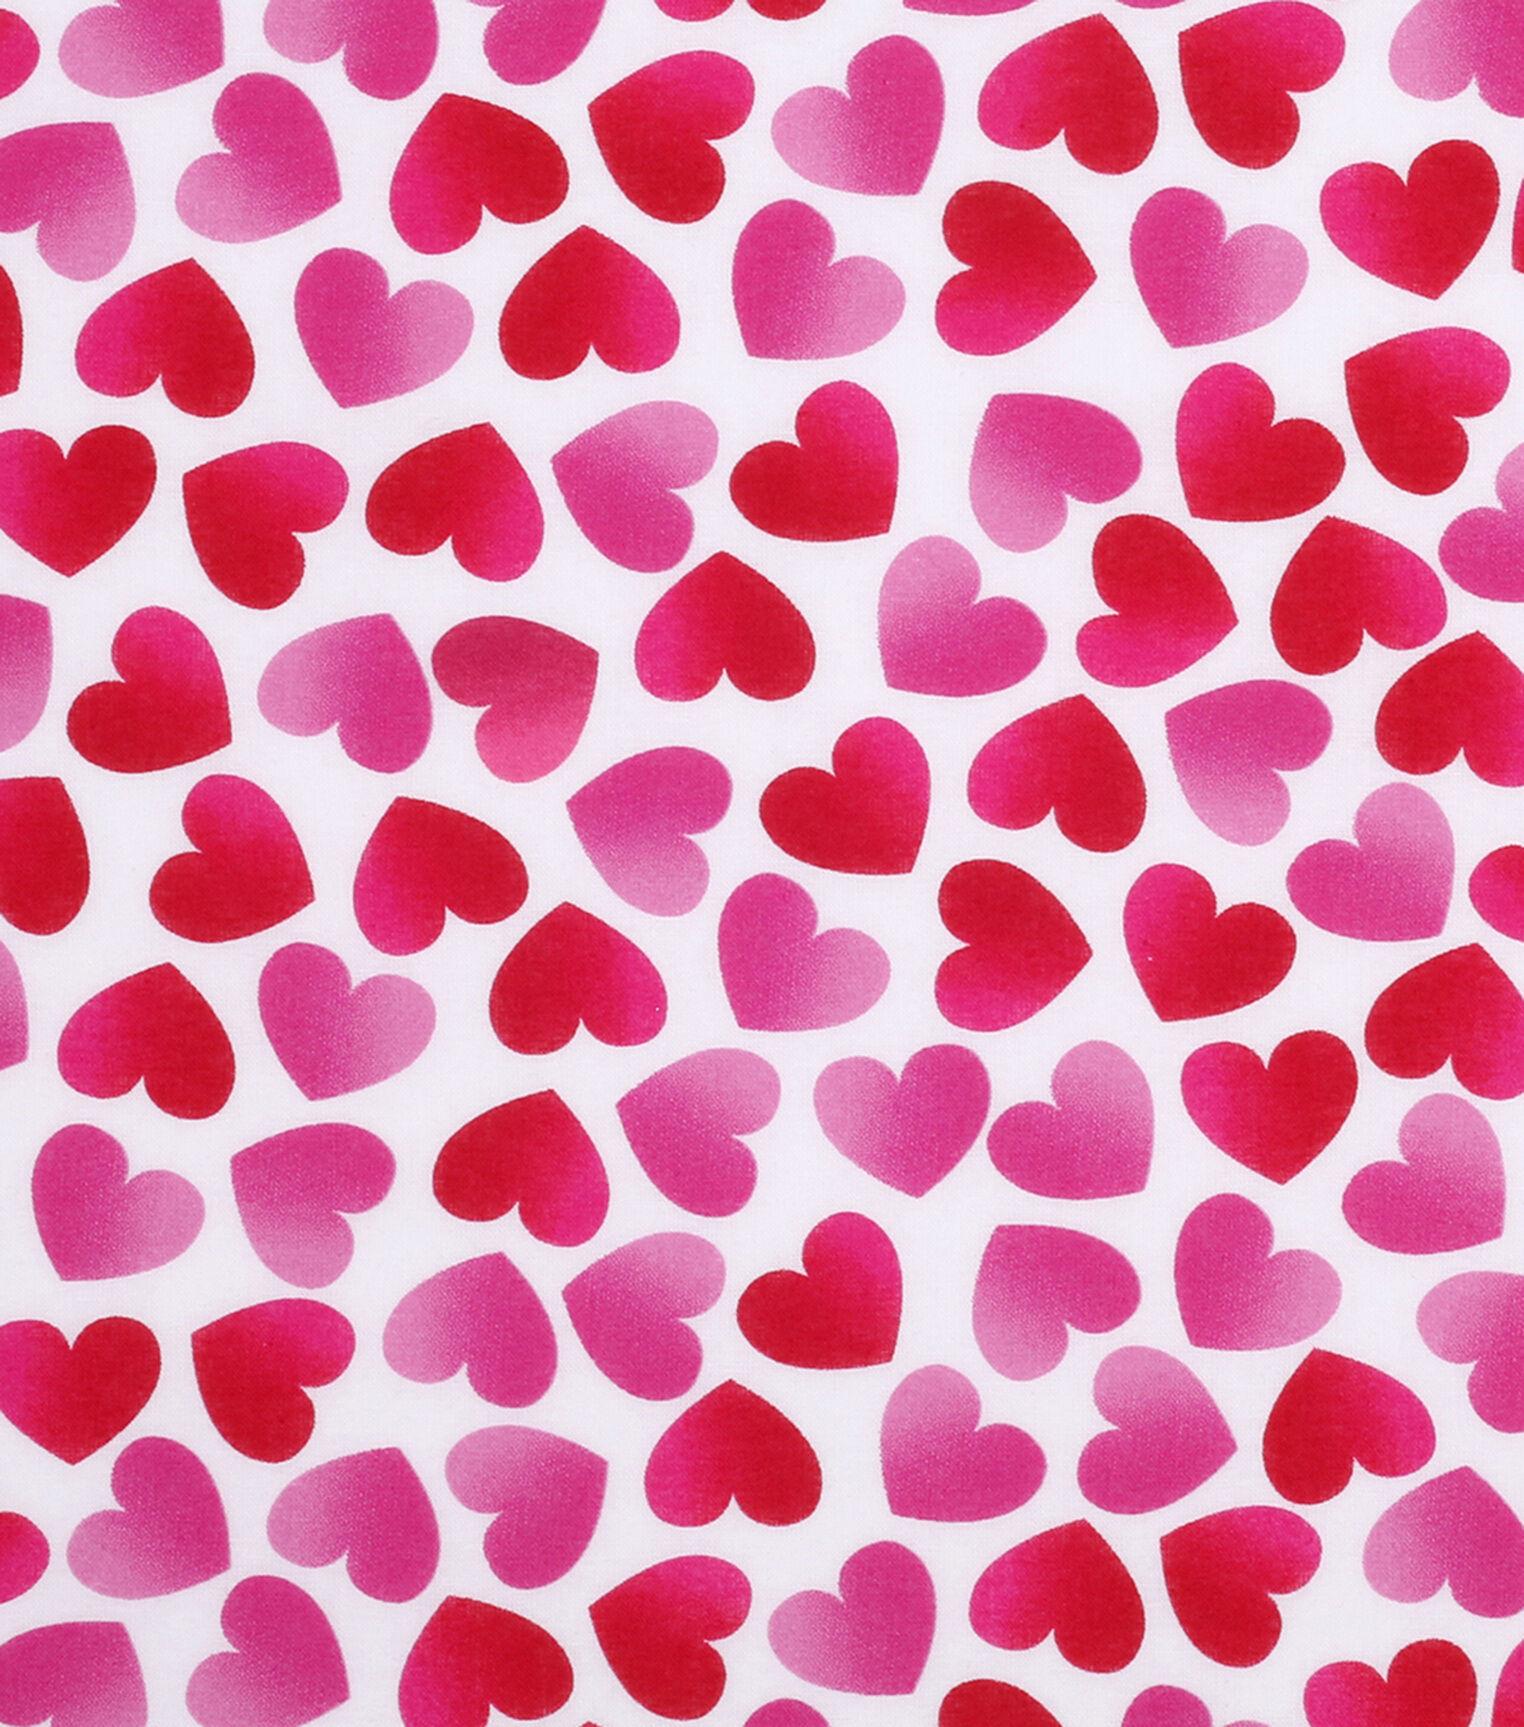 Schön Valentineu0027s Day Print Fabric 43u0027u0027 White With Pink Hearts